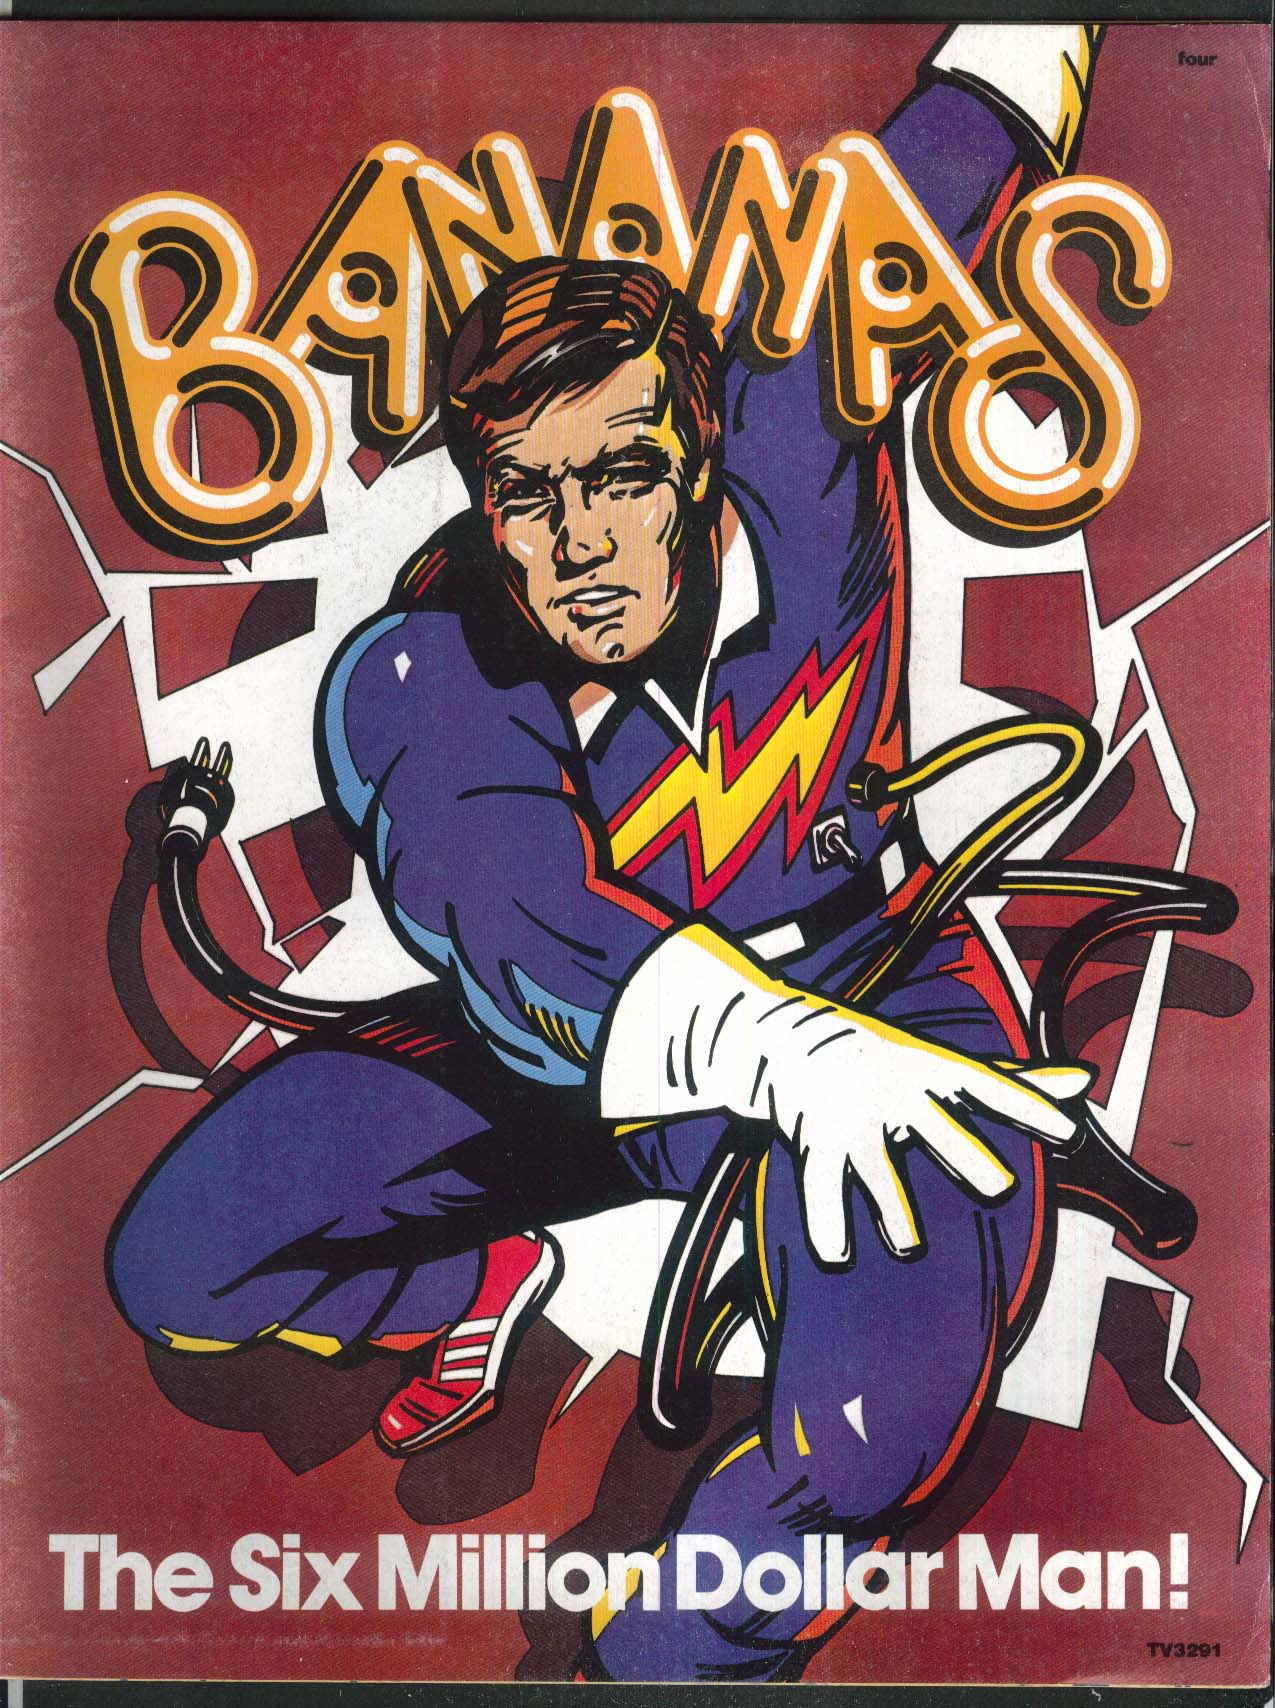 BANANAS #4 Lee Majors Six Million Dollar Man Linda Ronstadt Jerry Lewis 1976